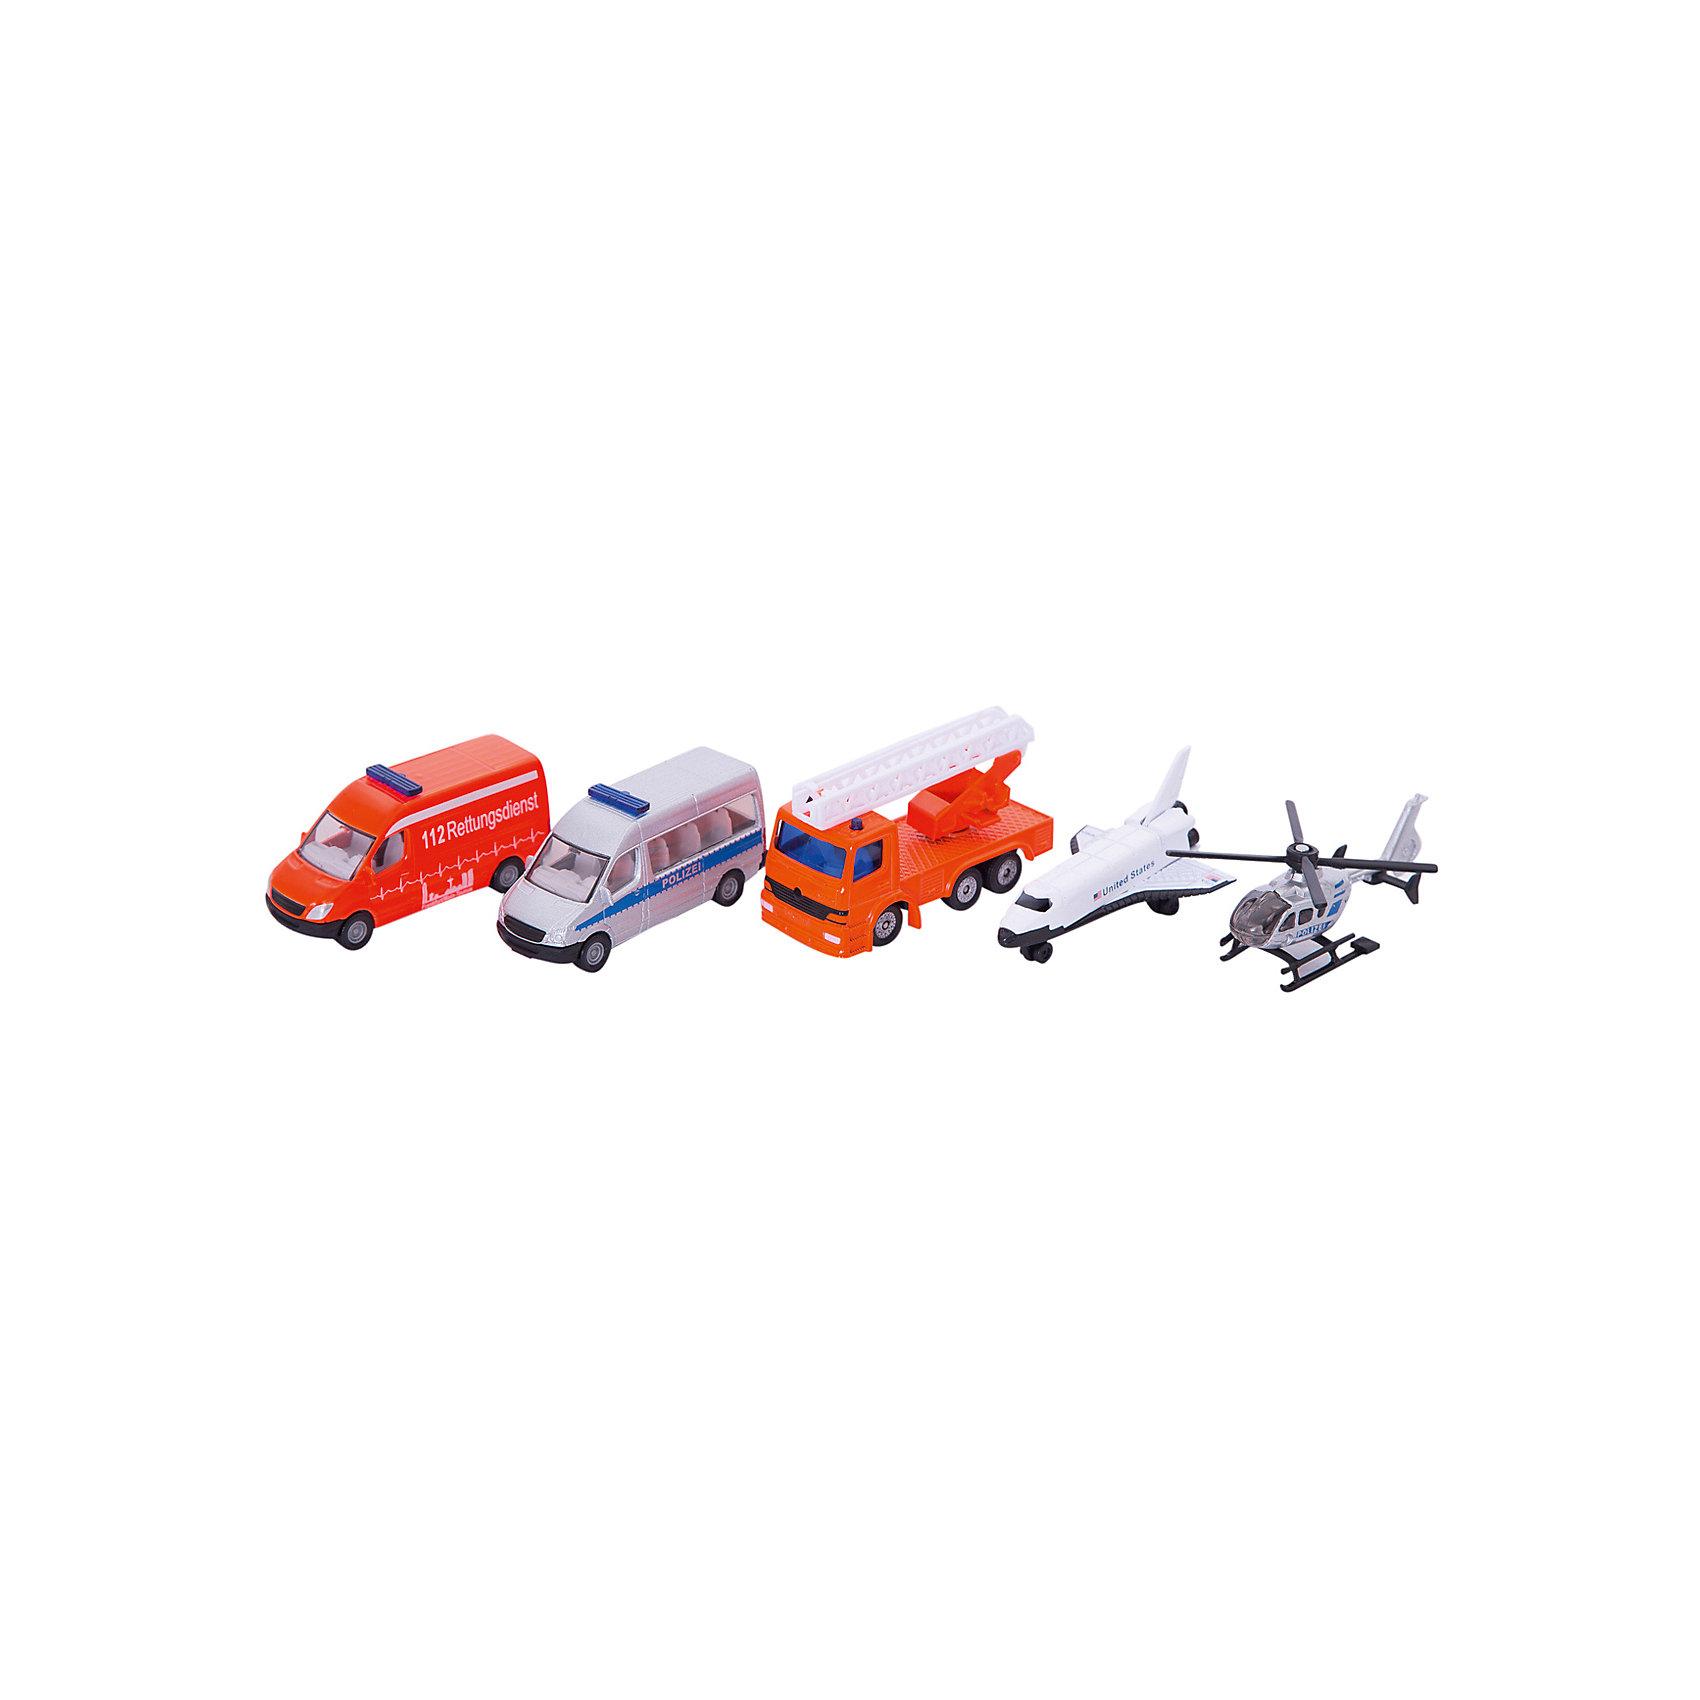 SIKU SIKU 6282 Набор Вертолет, самолет, 2-х микроавт.и кран игрушка siku ауди r8 8 0 3 7 2 4см 1430